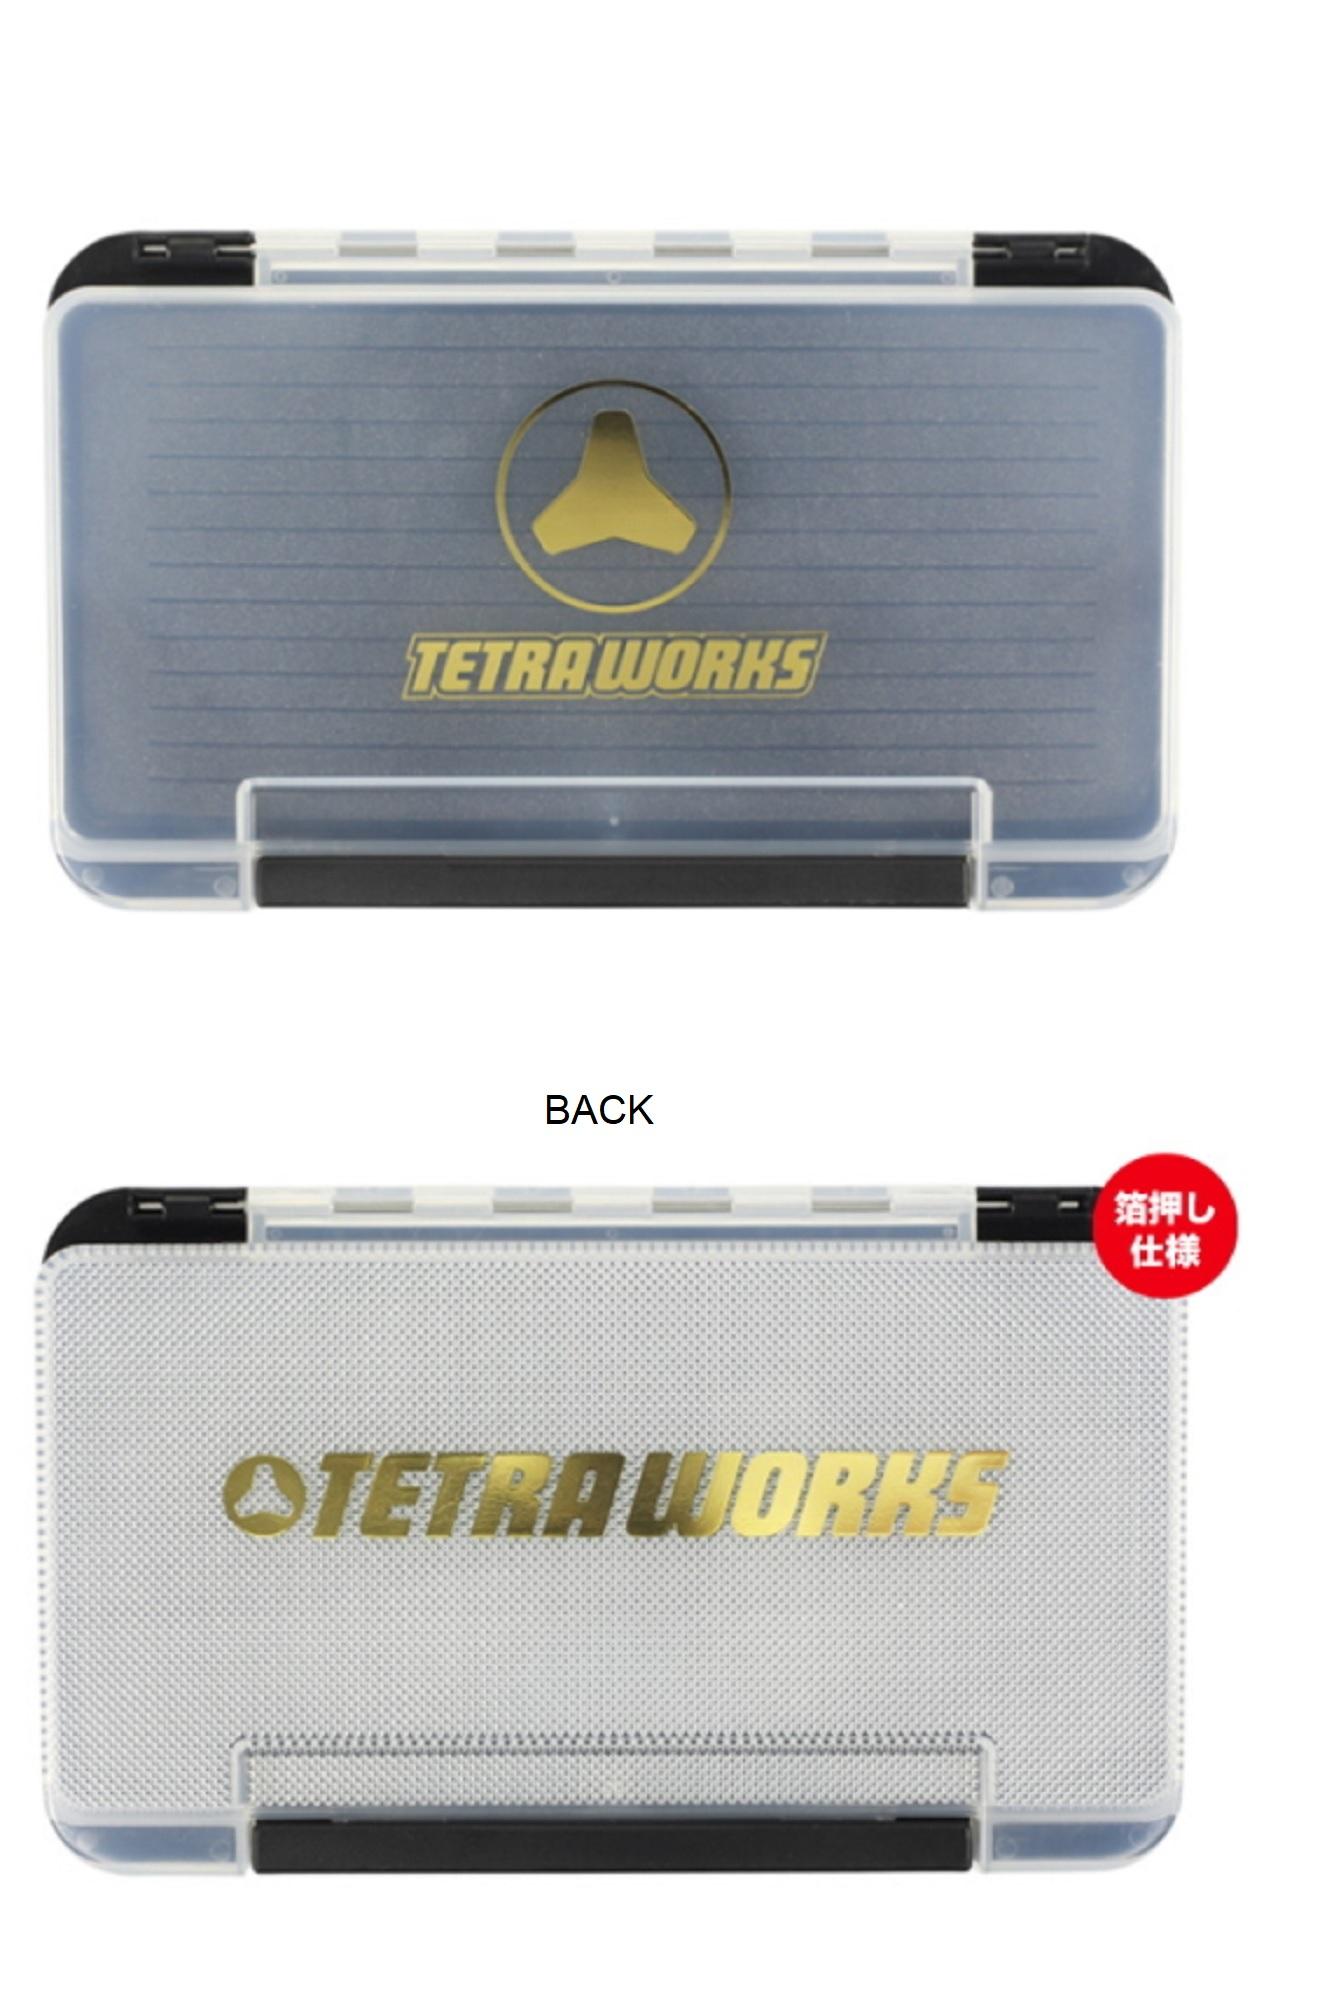 Duo Meiho Tackle Box Tetra Works Run Gun Case 1010W 175 x 105 x 38 mm B (1011)